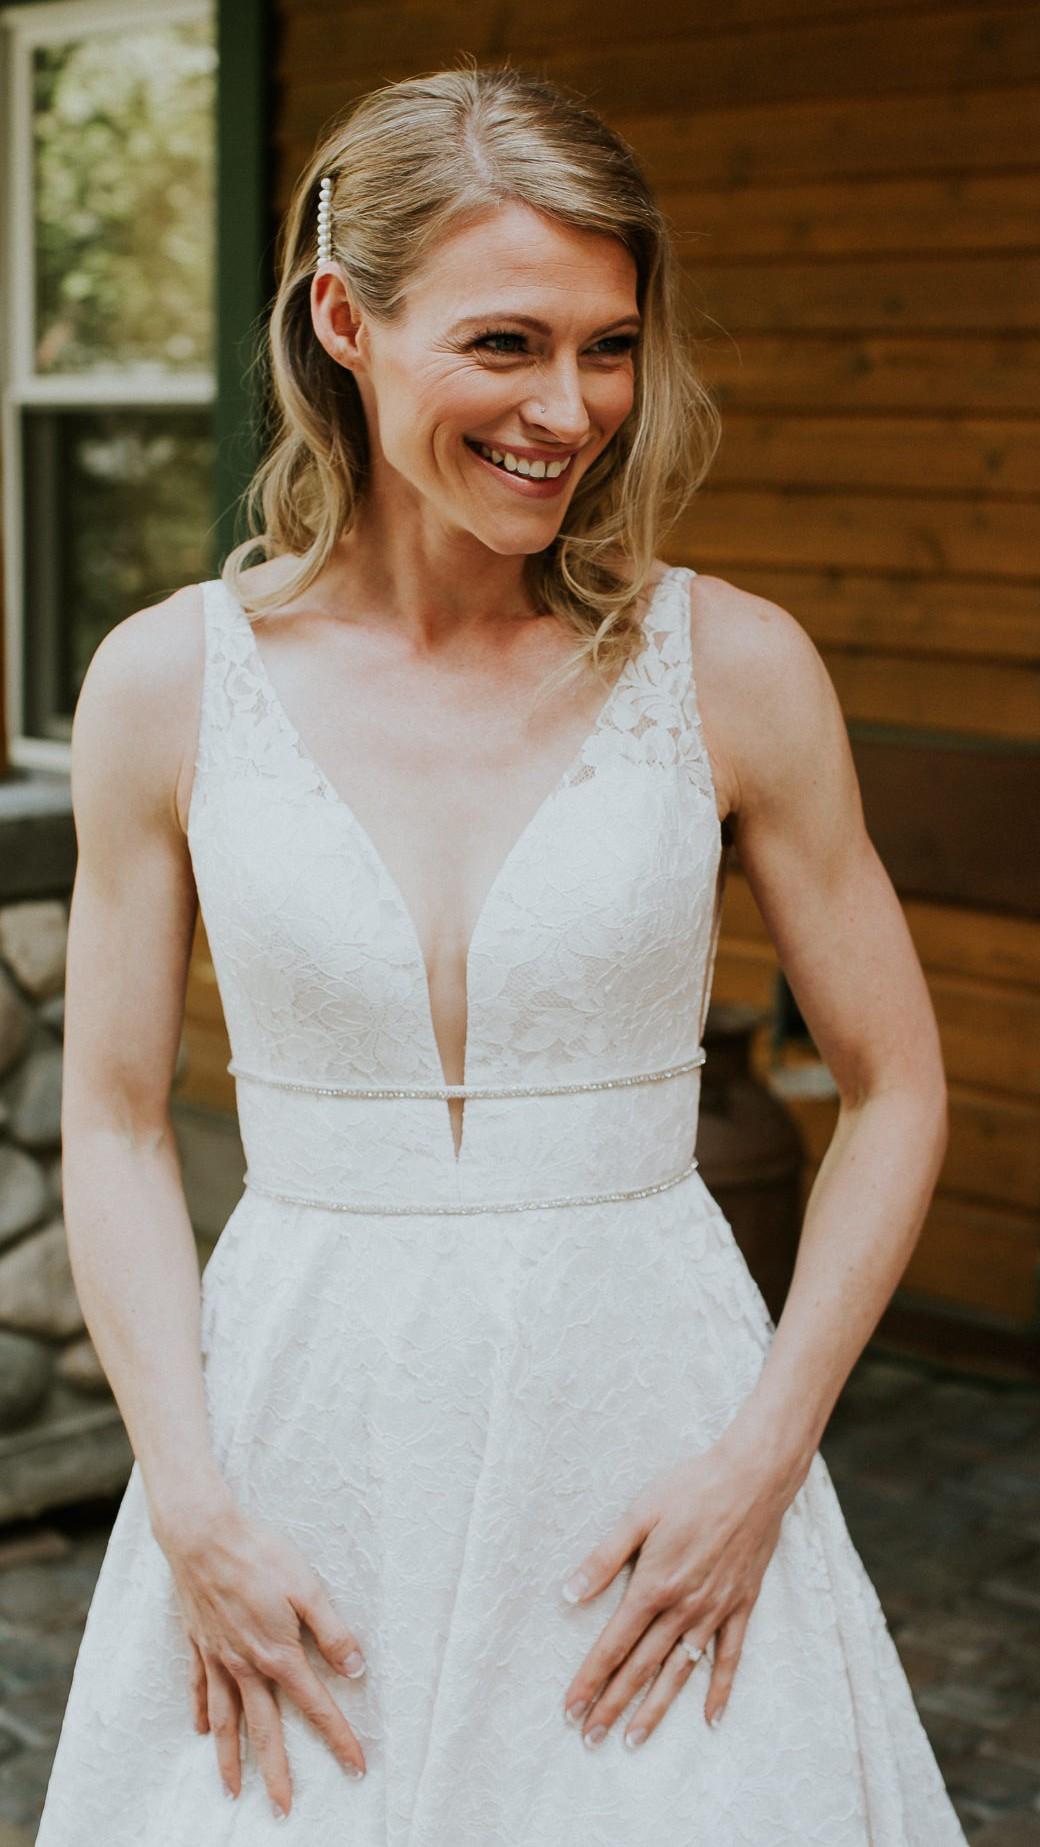 Skirt Slit Wedding Dress - Style #4800   Paloma Blanca